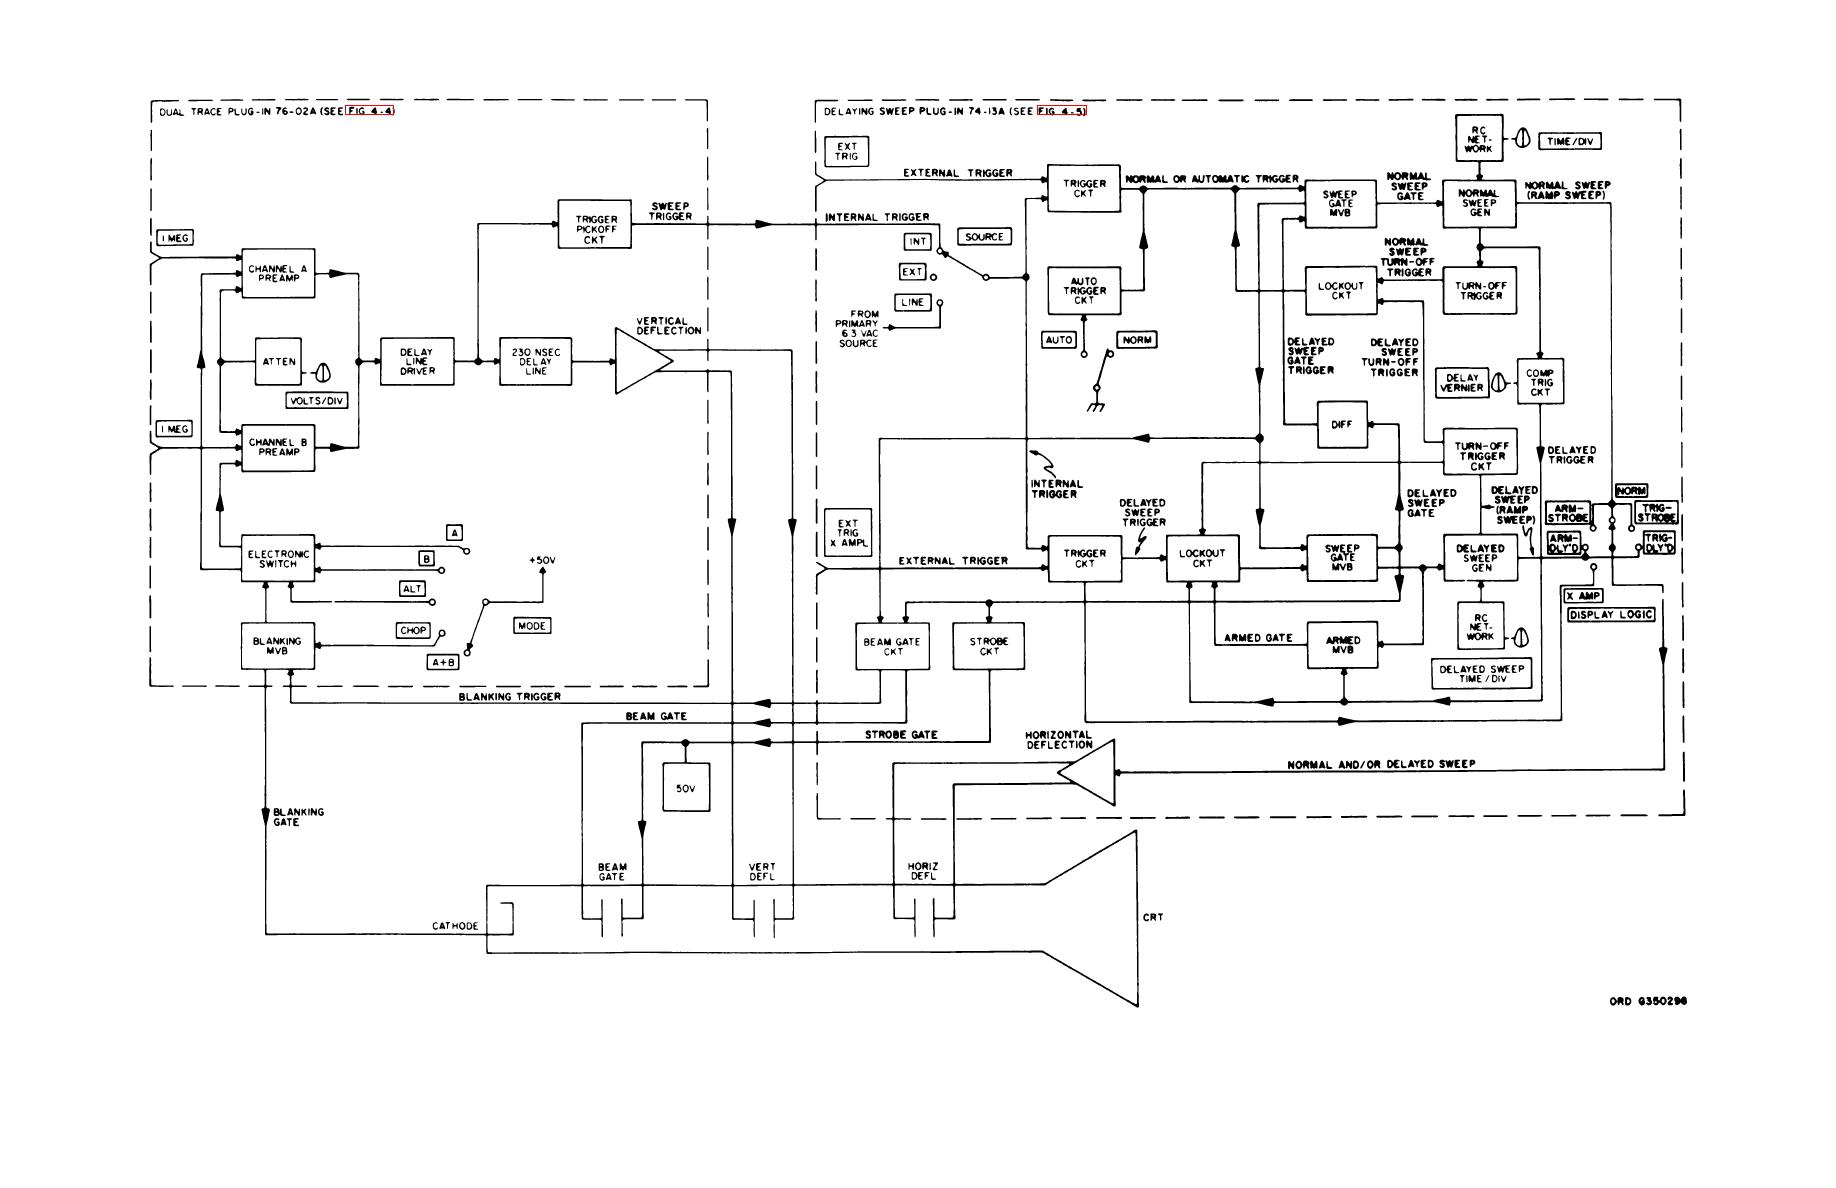 Figure 4 2 Oscilloscope Block Diagram